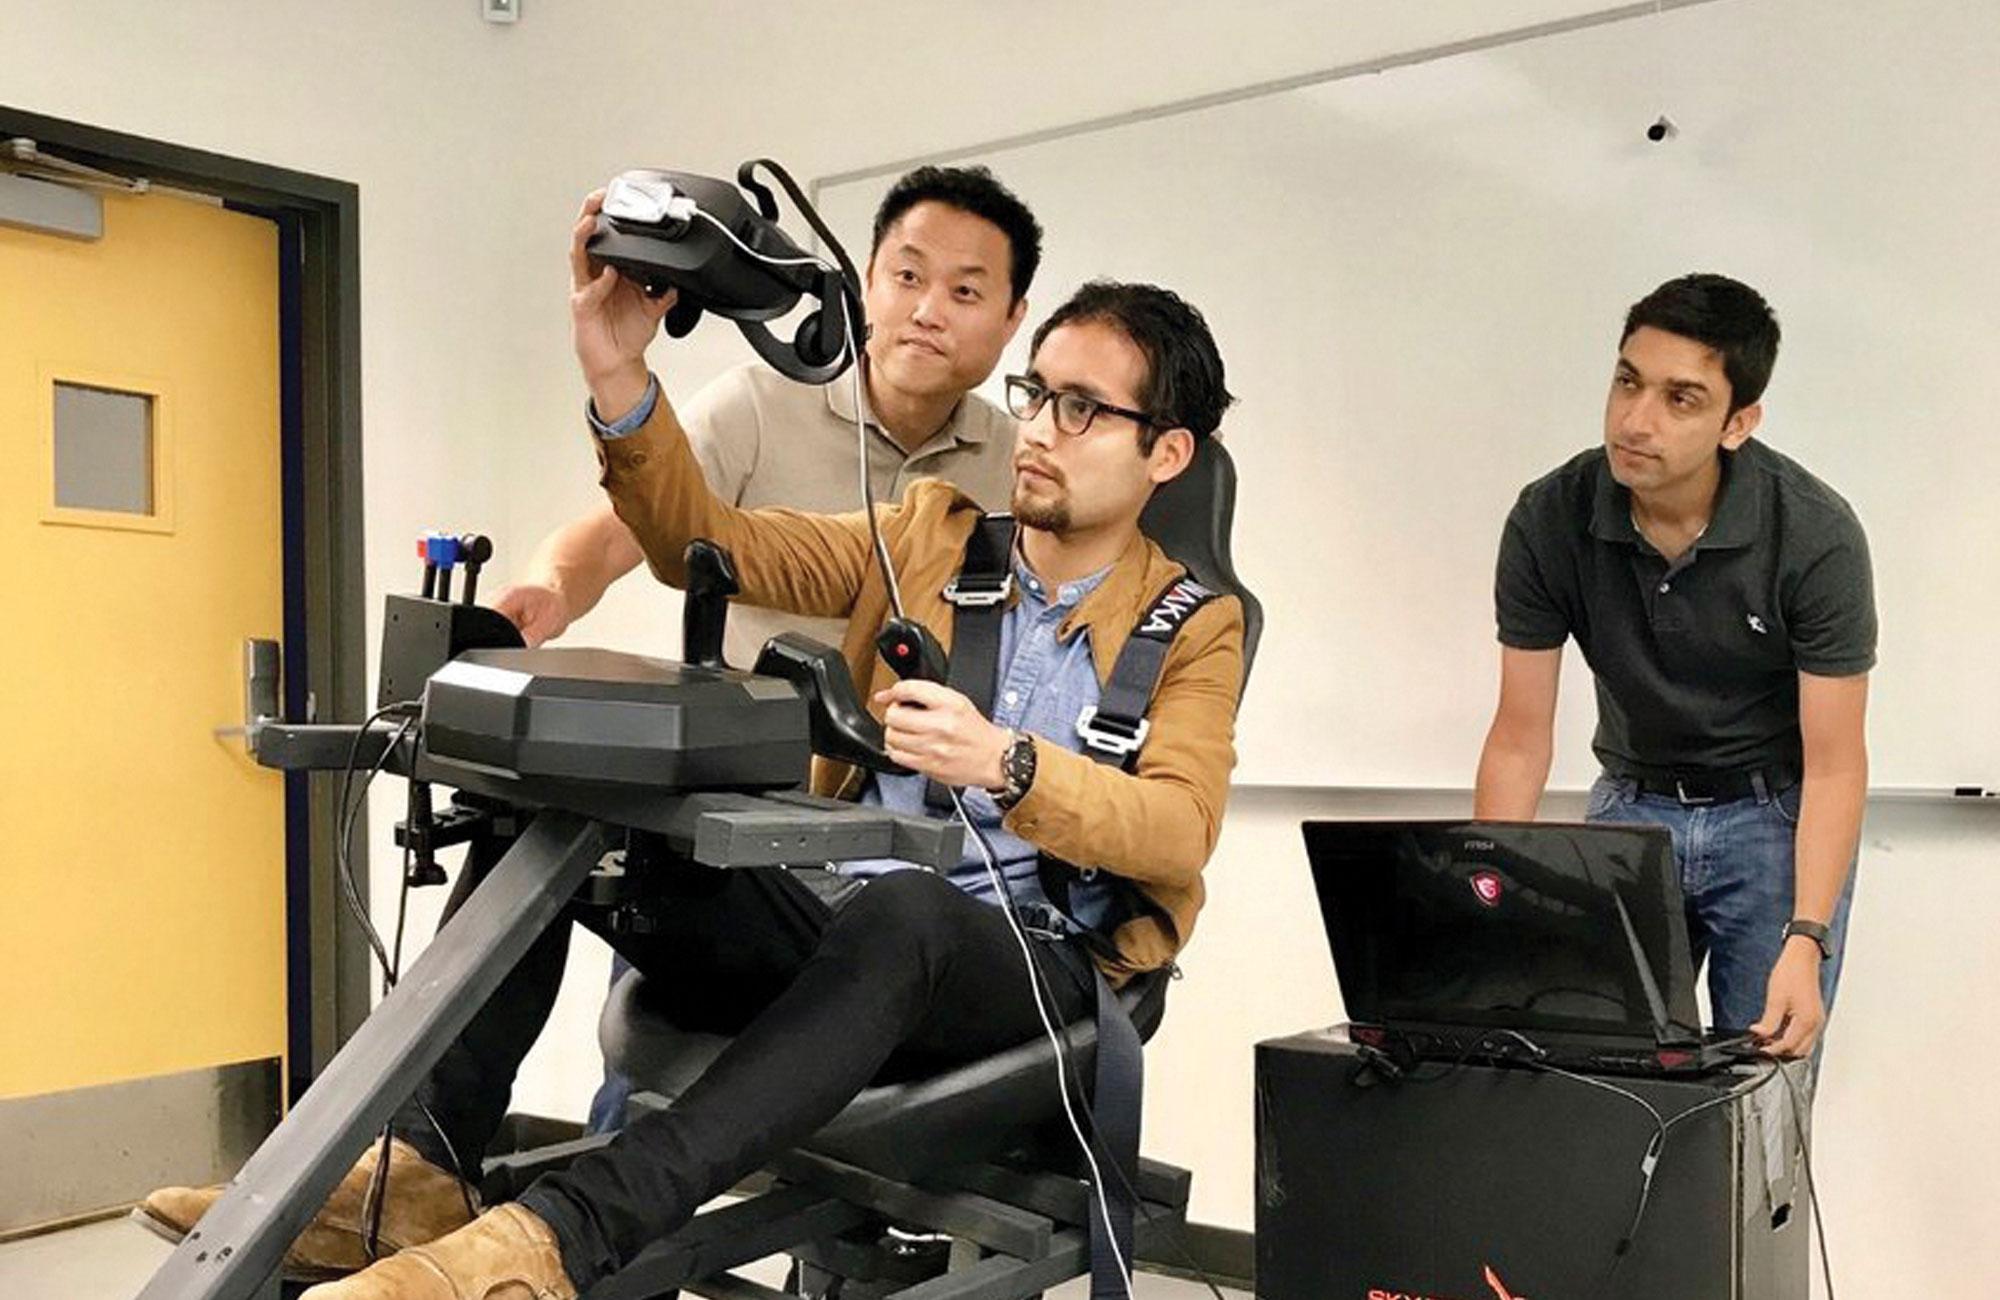 Dr. Jong-Hoon Kim, Irvin Steve Cardenas, and Dr. Gokarna Sharma check out the ImmersiFLY flight simulator